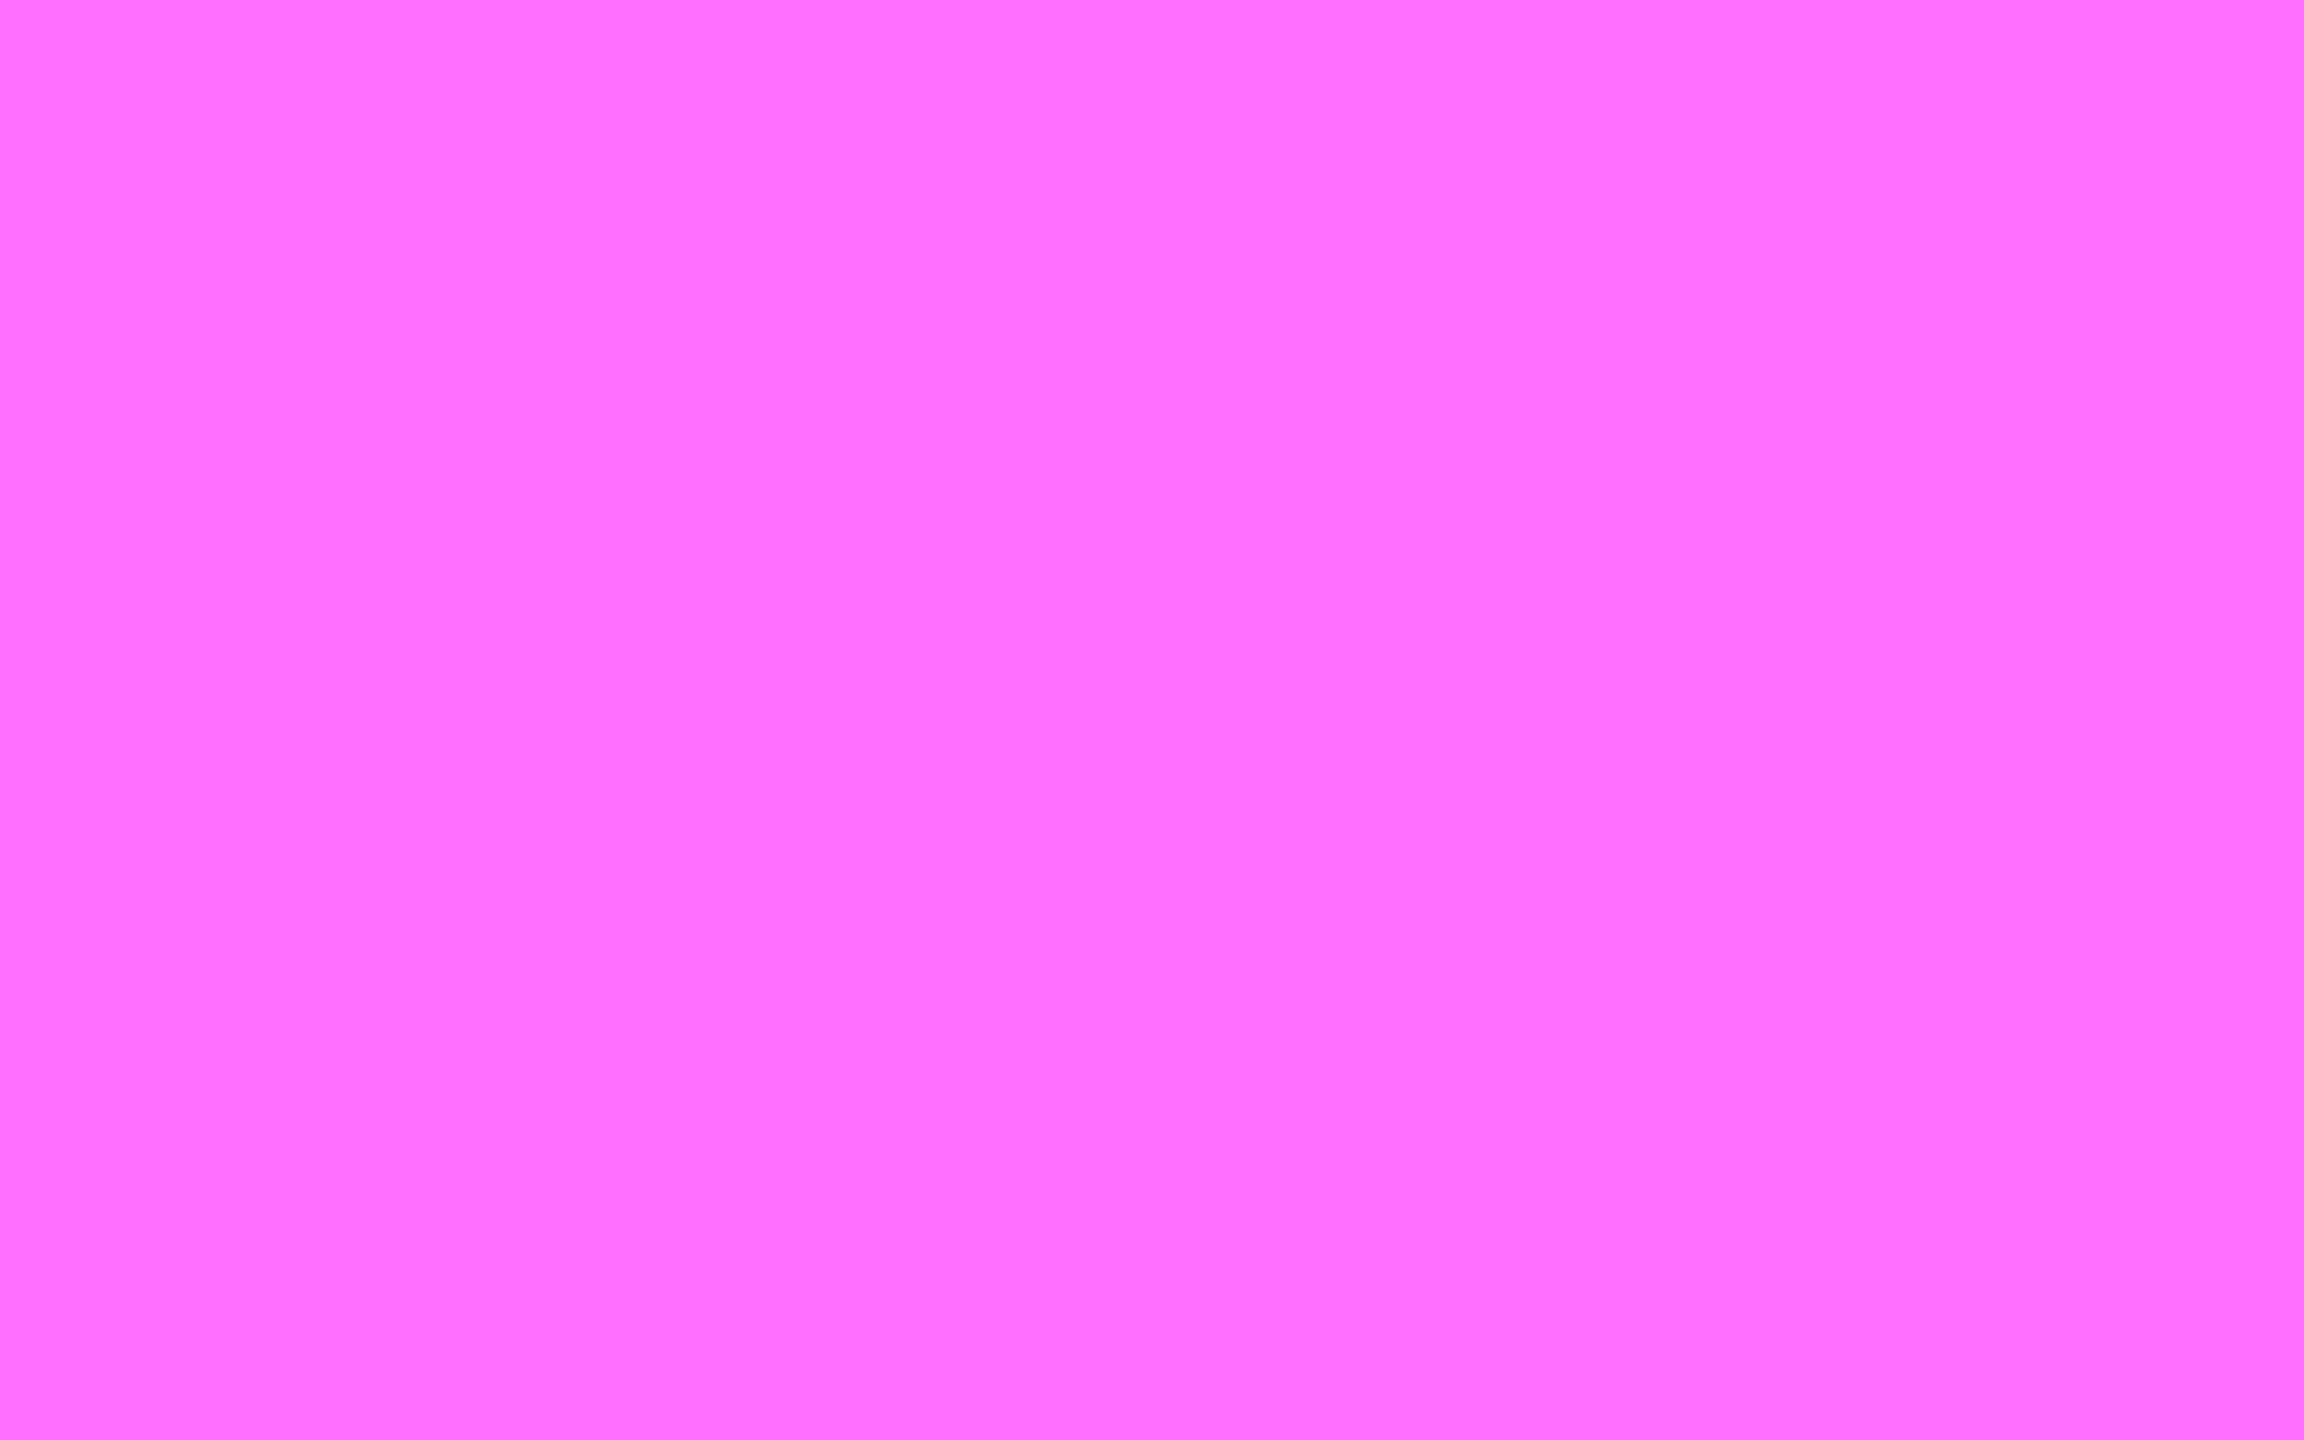 2304x1440 Shocking Pink Crayola Solid Color Background